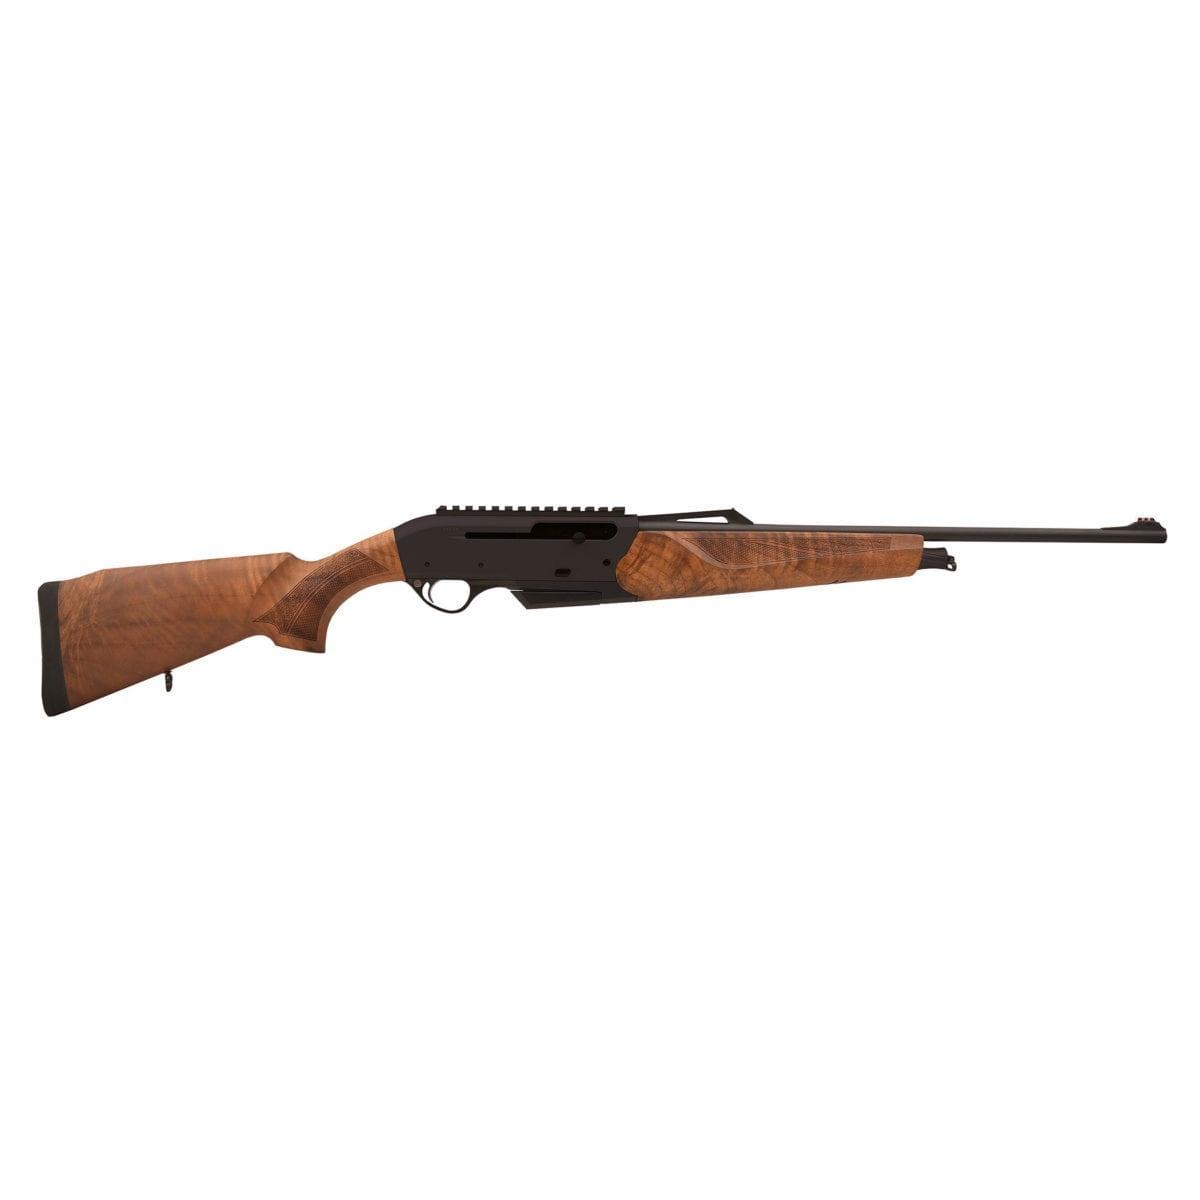 Revolution Arms Revolution Arms NX18 .410 Gauge Semi Auto Wood/ Blued w/ Vent Rib